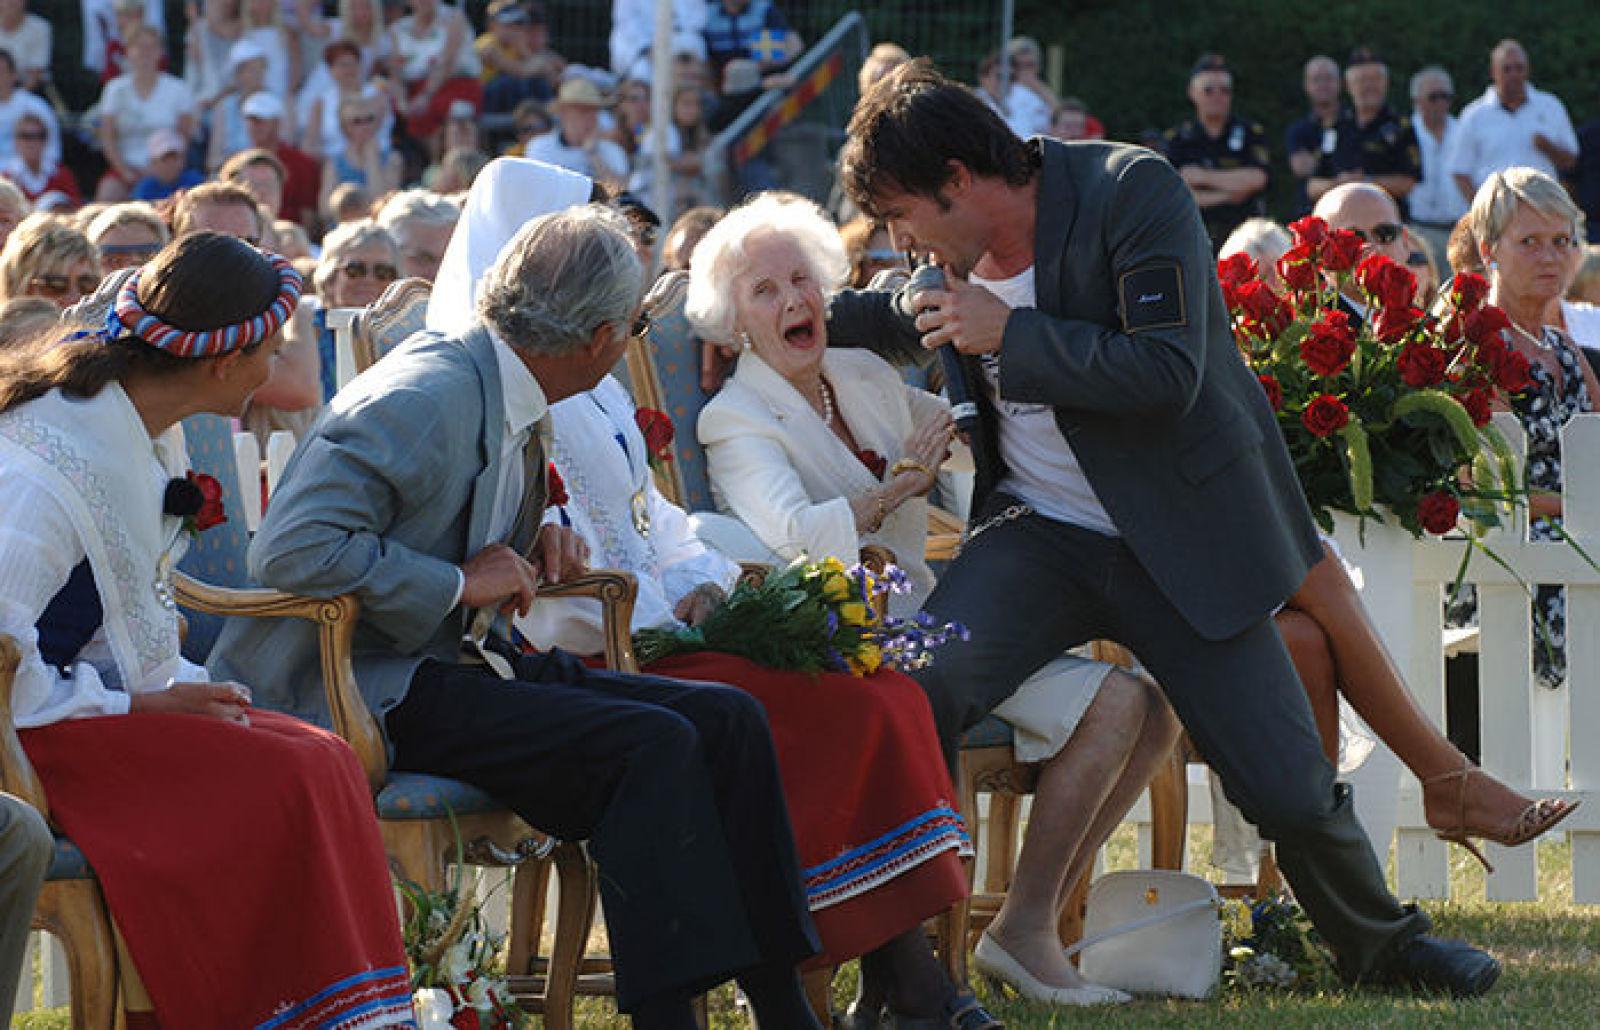 На праздновании 28 дня рождения артист Martin Stenmarck предподнёс сюрприз принцессе Лилиан